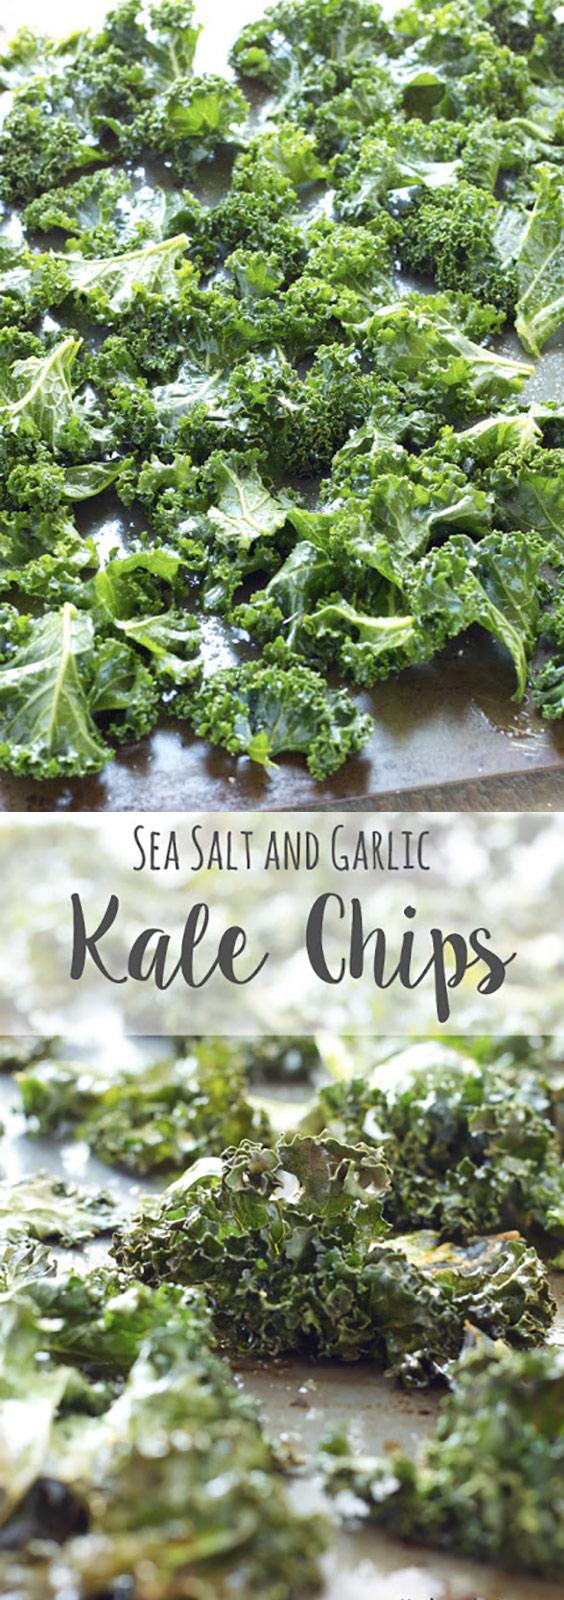 No Fail Sea Salt and Garlic Kale Chips